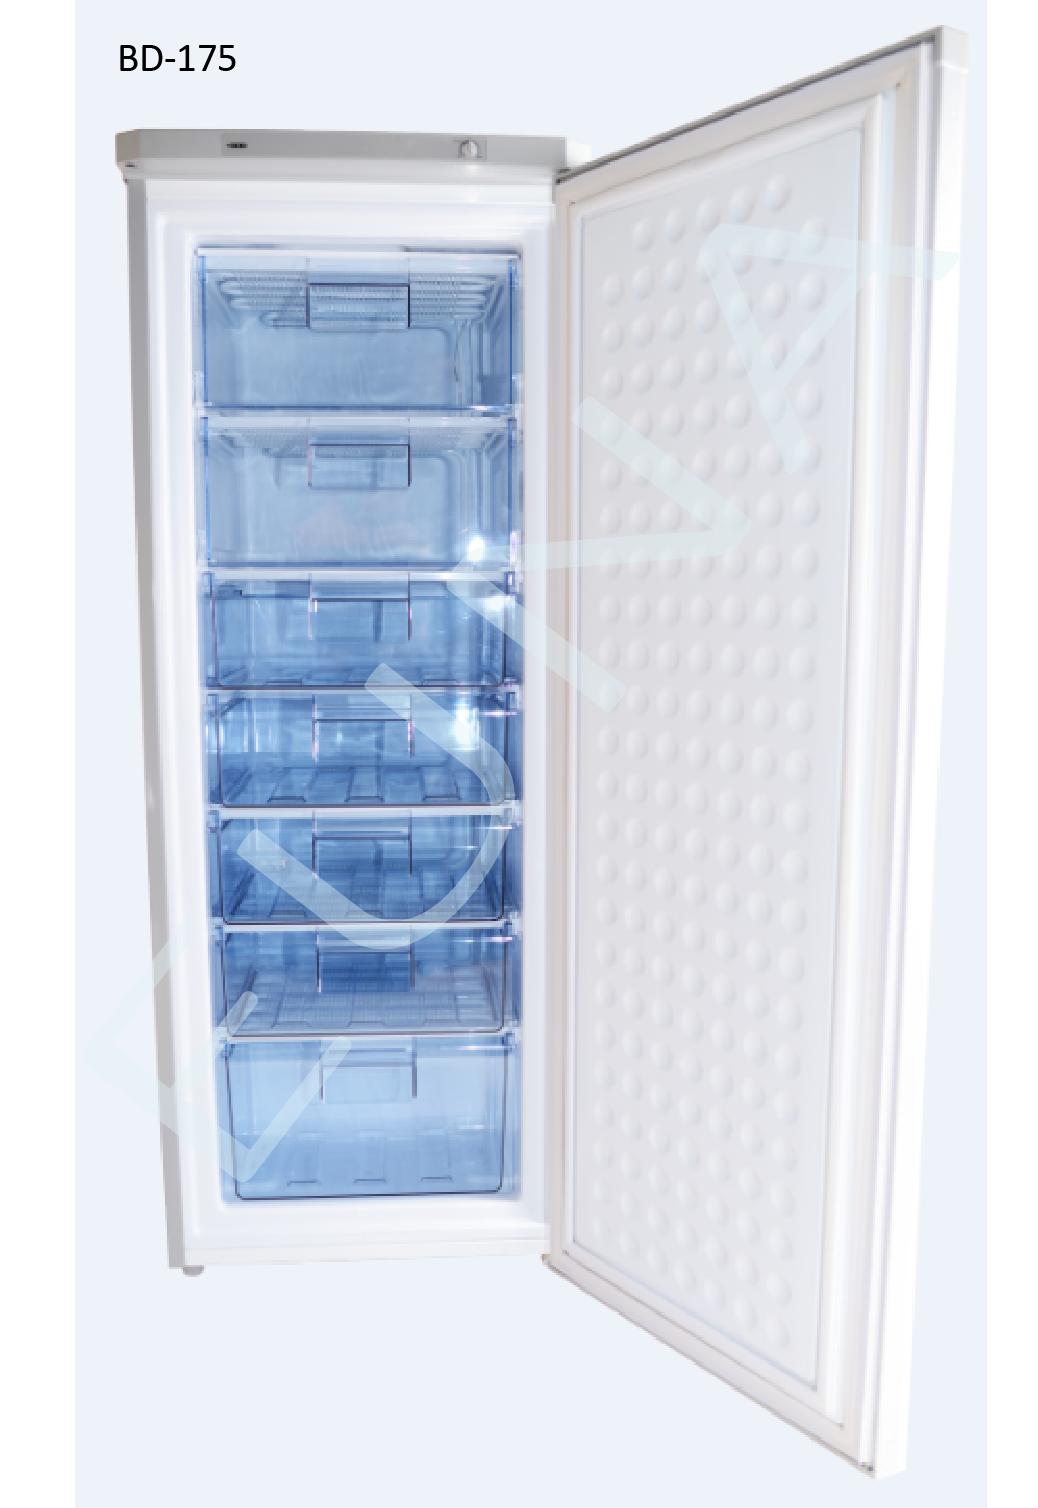 BD-175 freezer